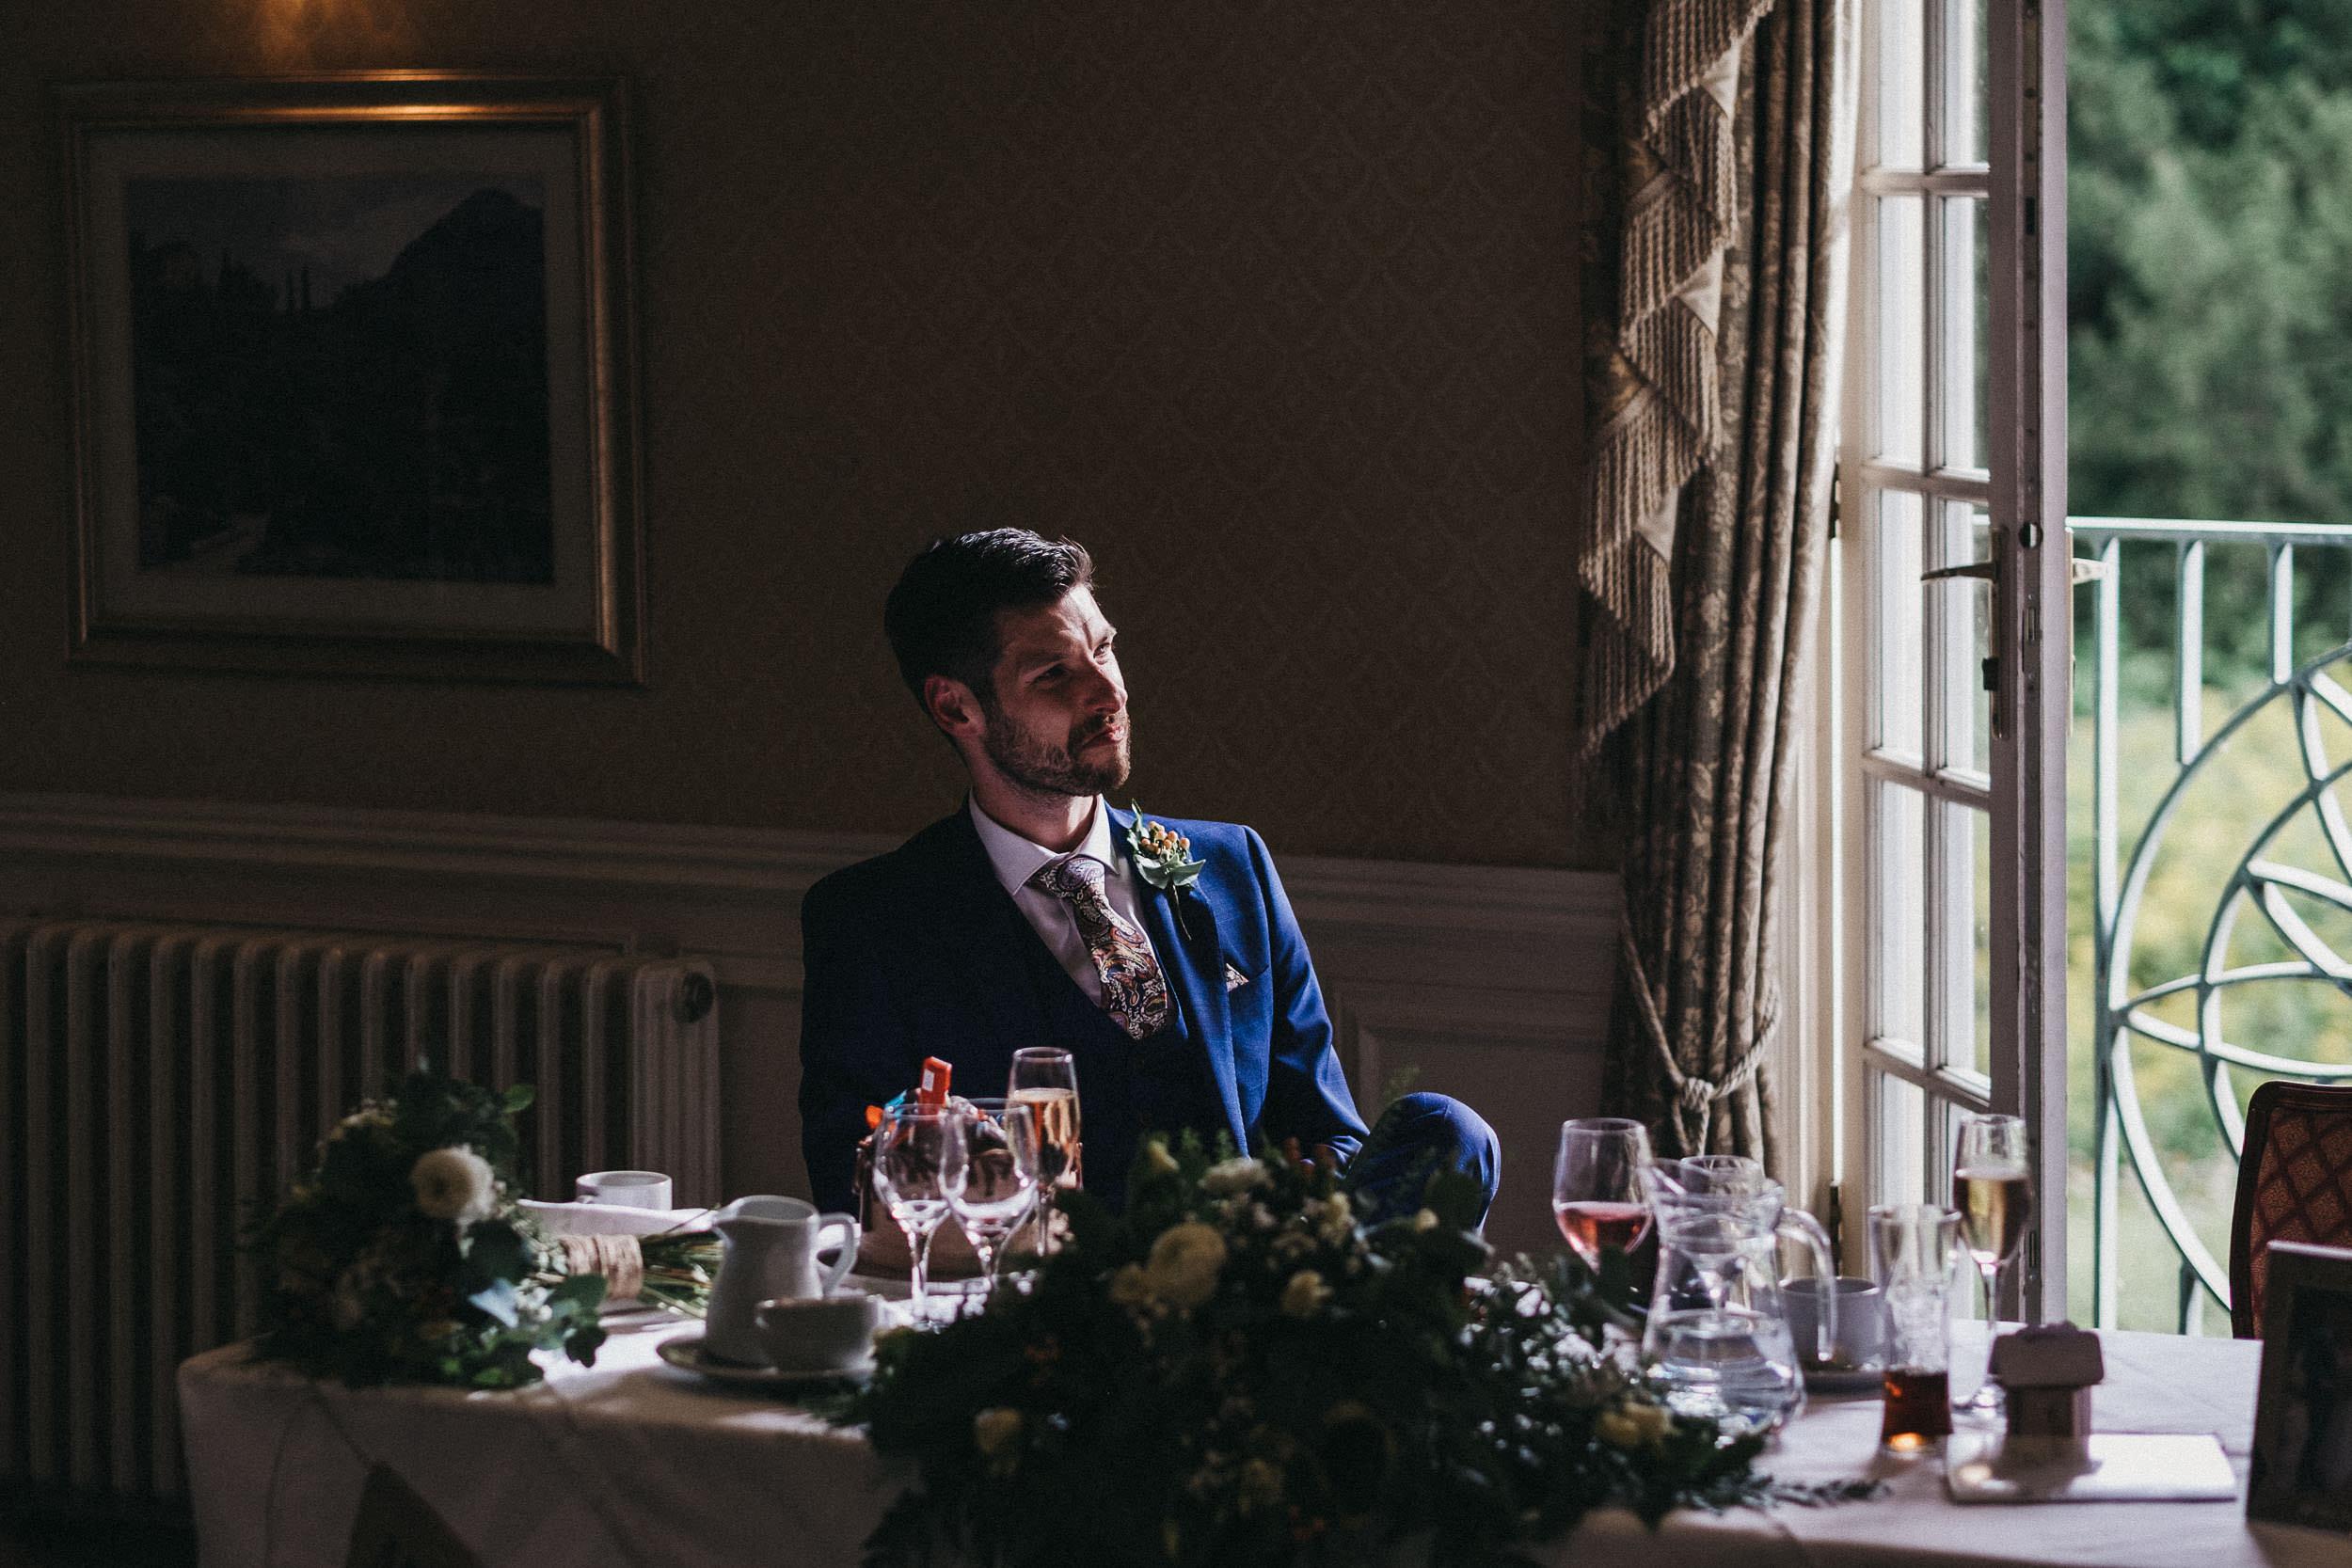 Moody photo of groom watching wedding speeches